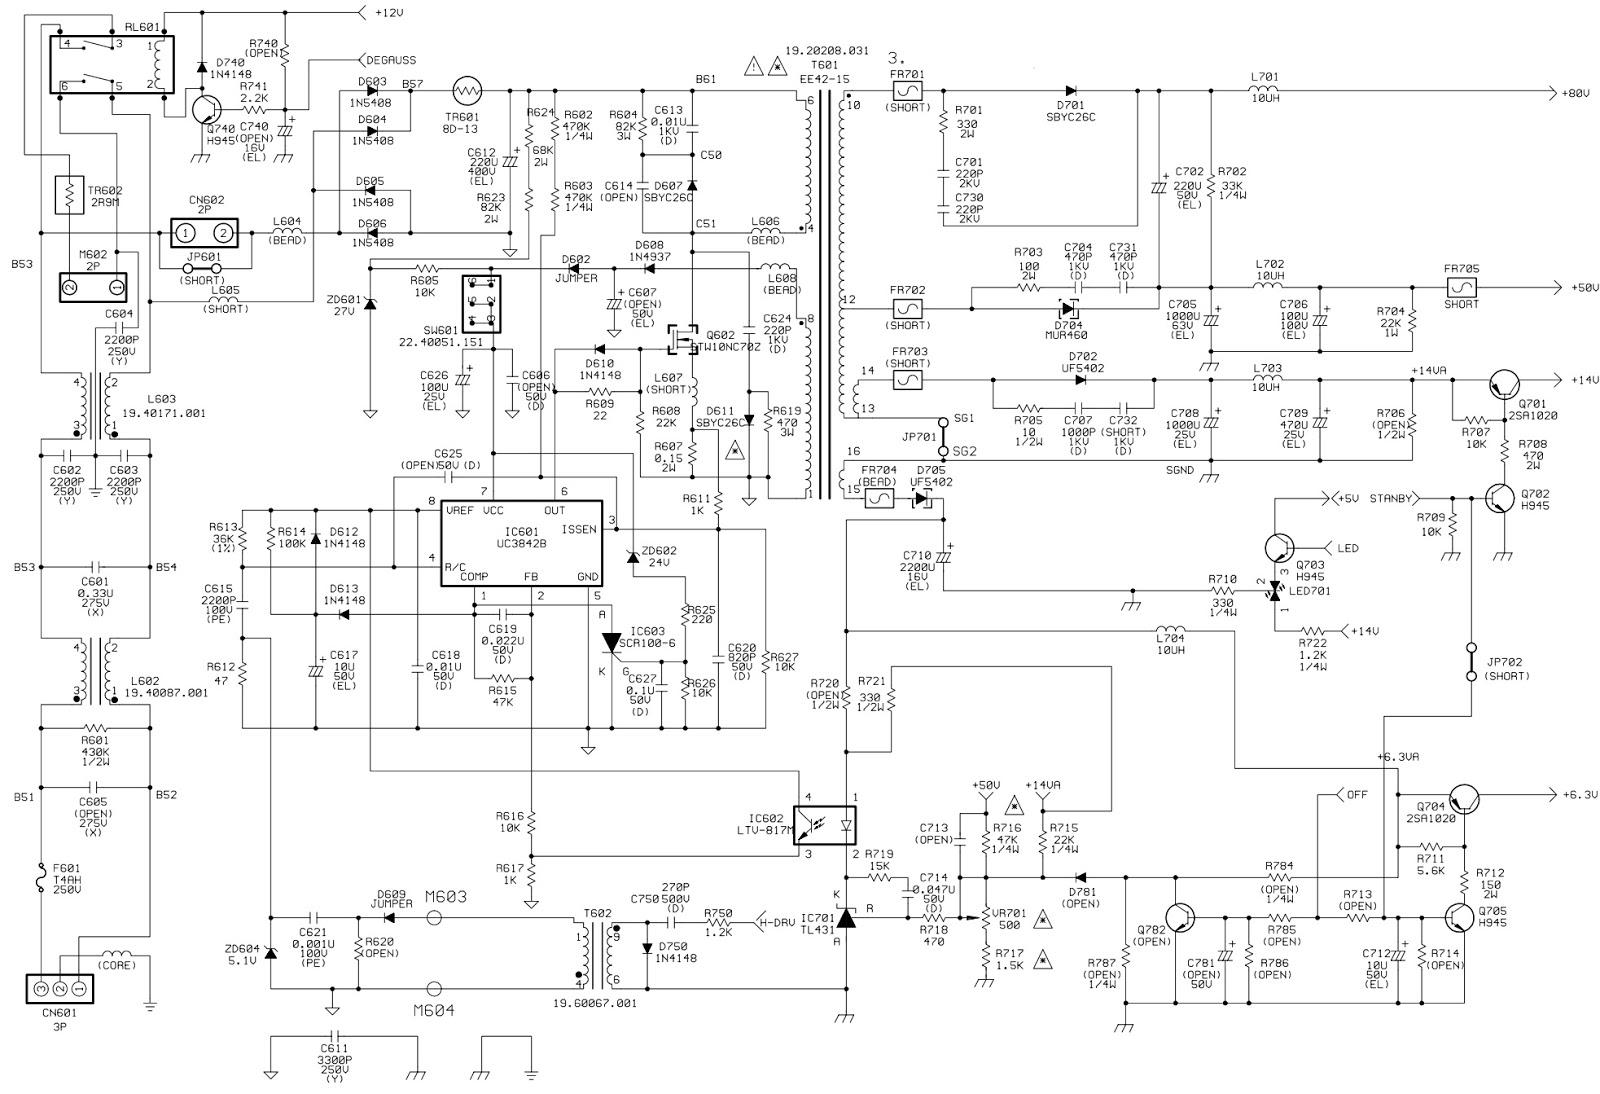 Remarkable Mitsubishi Galant Stereo Wiring Diagram Free Download Wiring Diagram Wiring Cloud Filiciilluminateatxorg